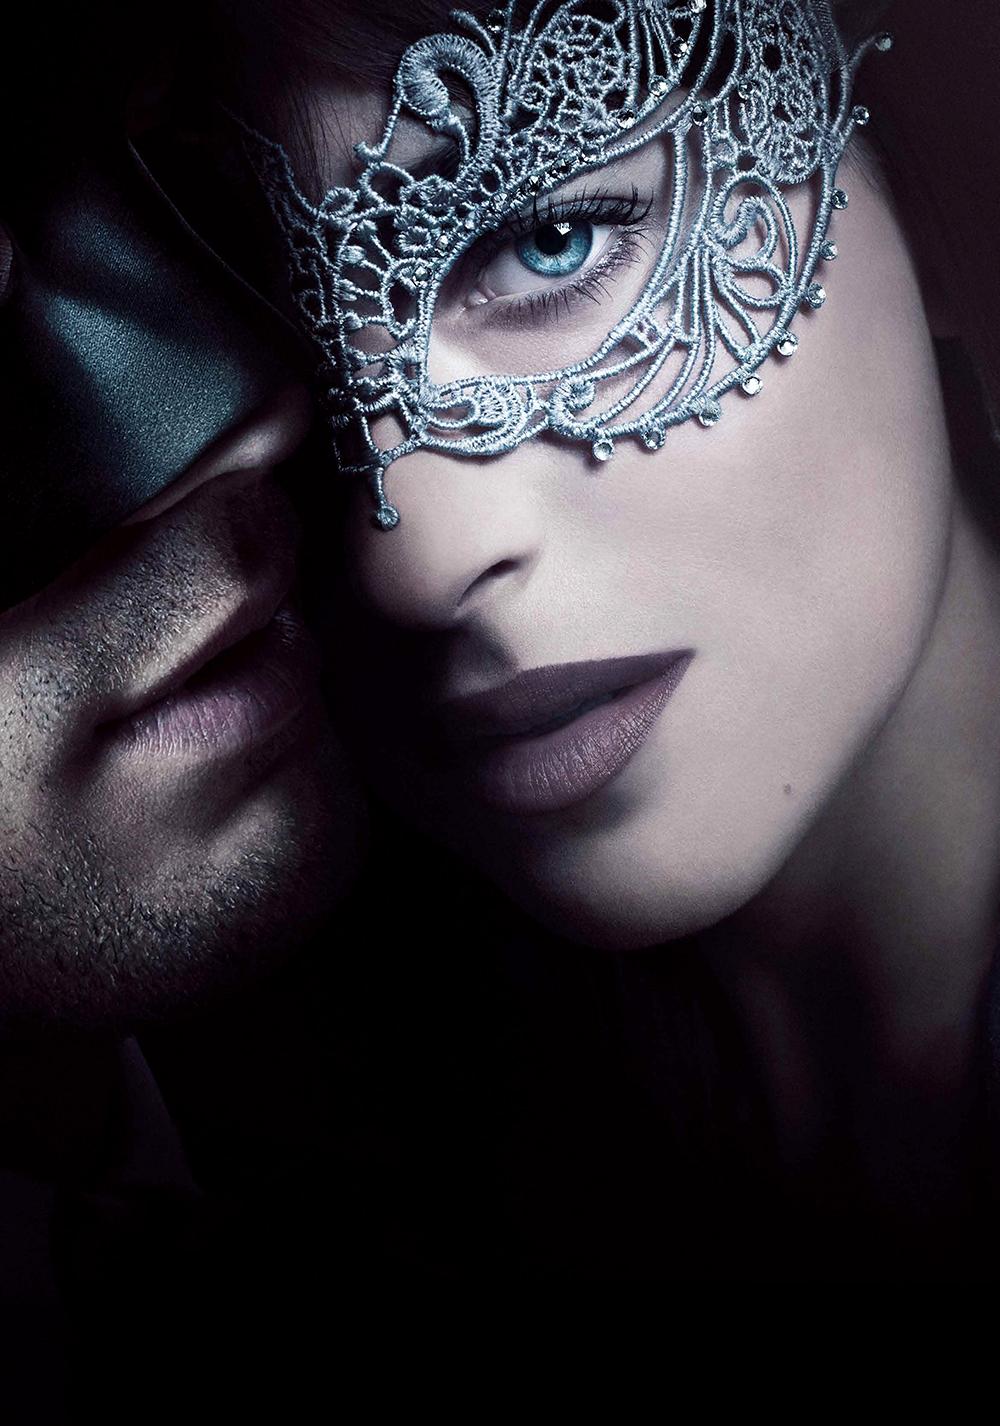 Fifty Shades Darker UK Trailer, Posters & Images - HeyUGuys